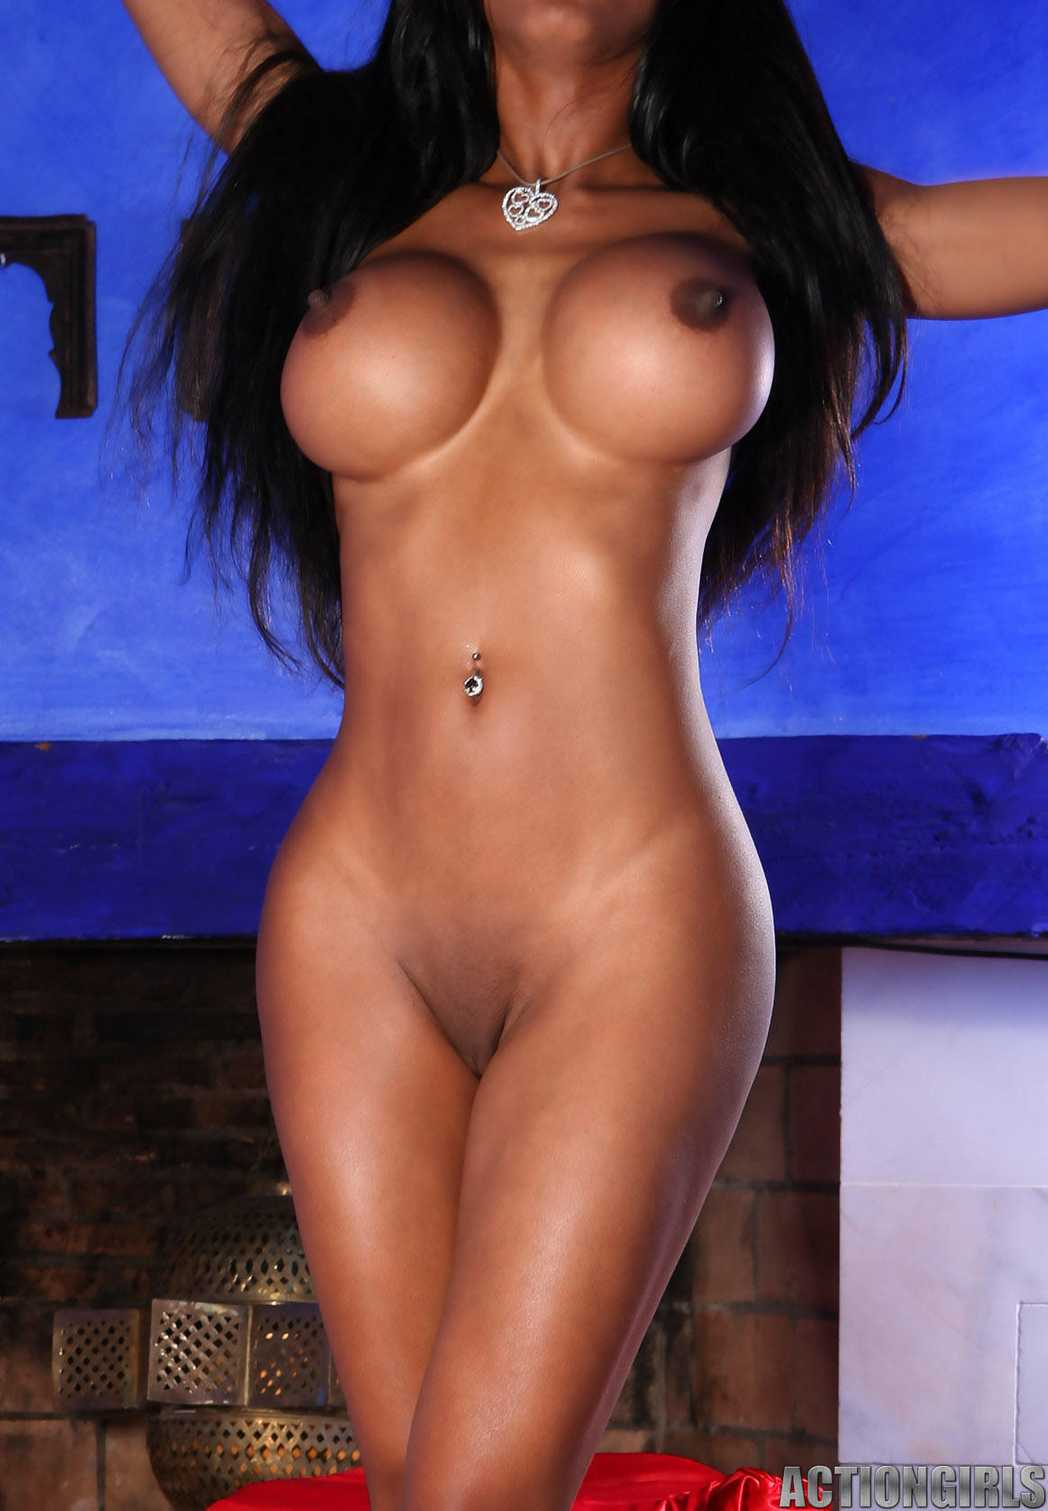 noire gros seins silicone (8)